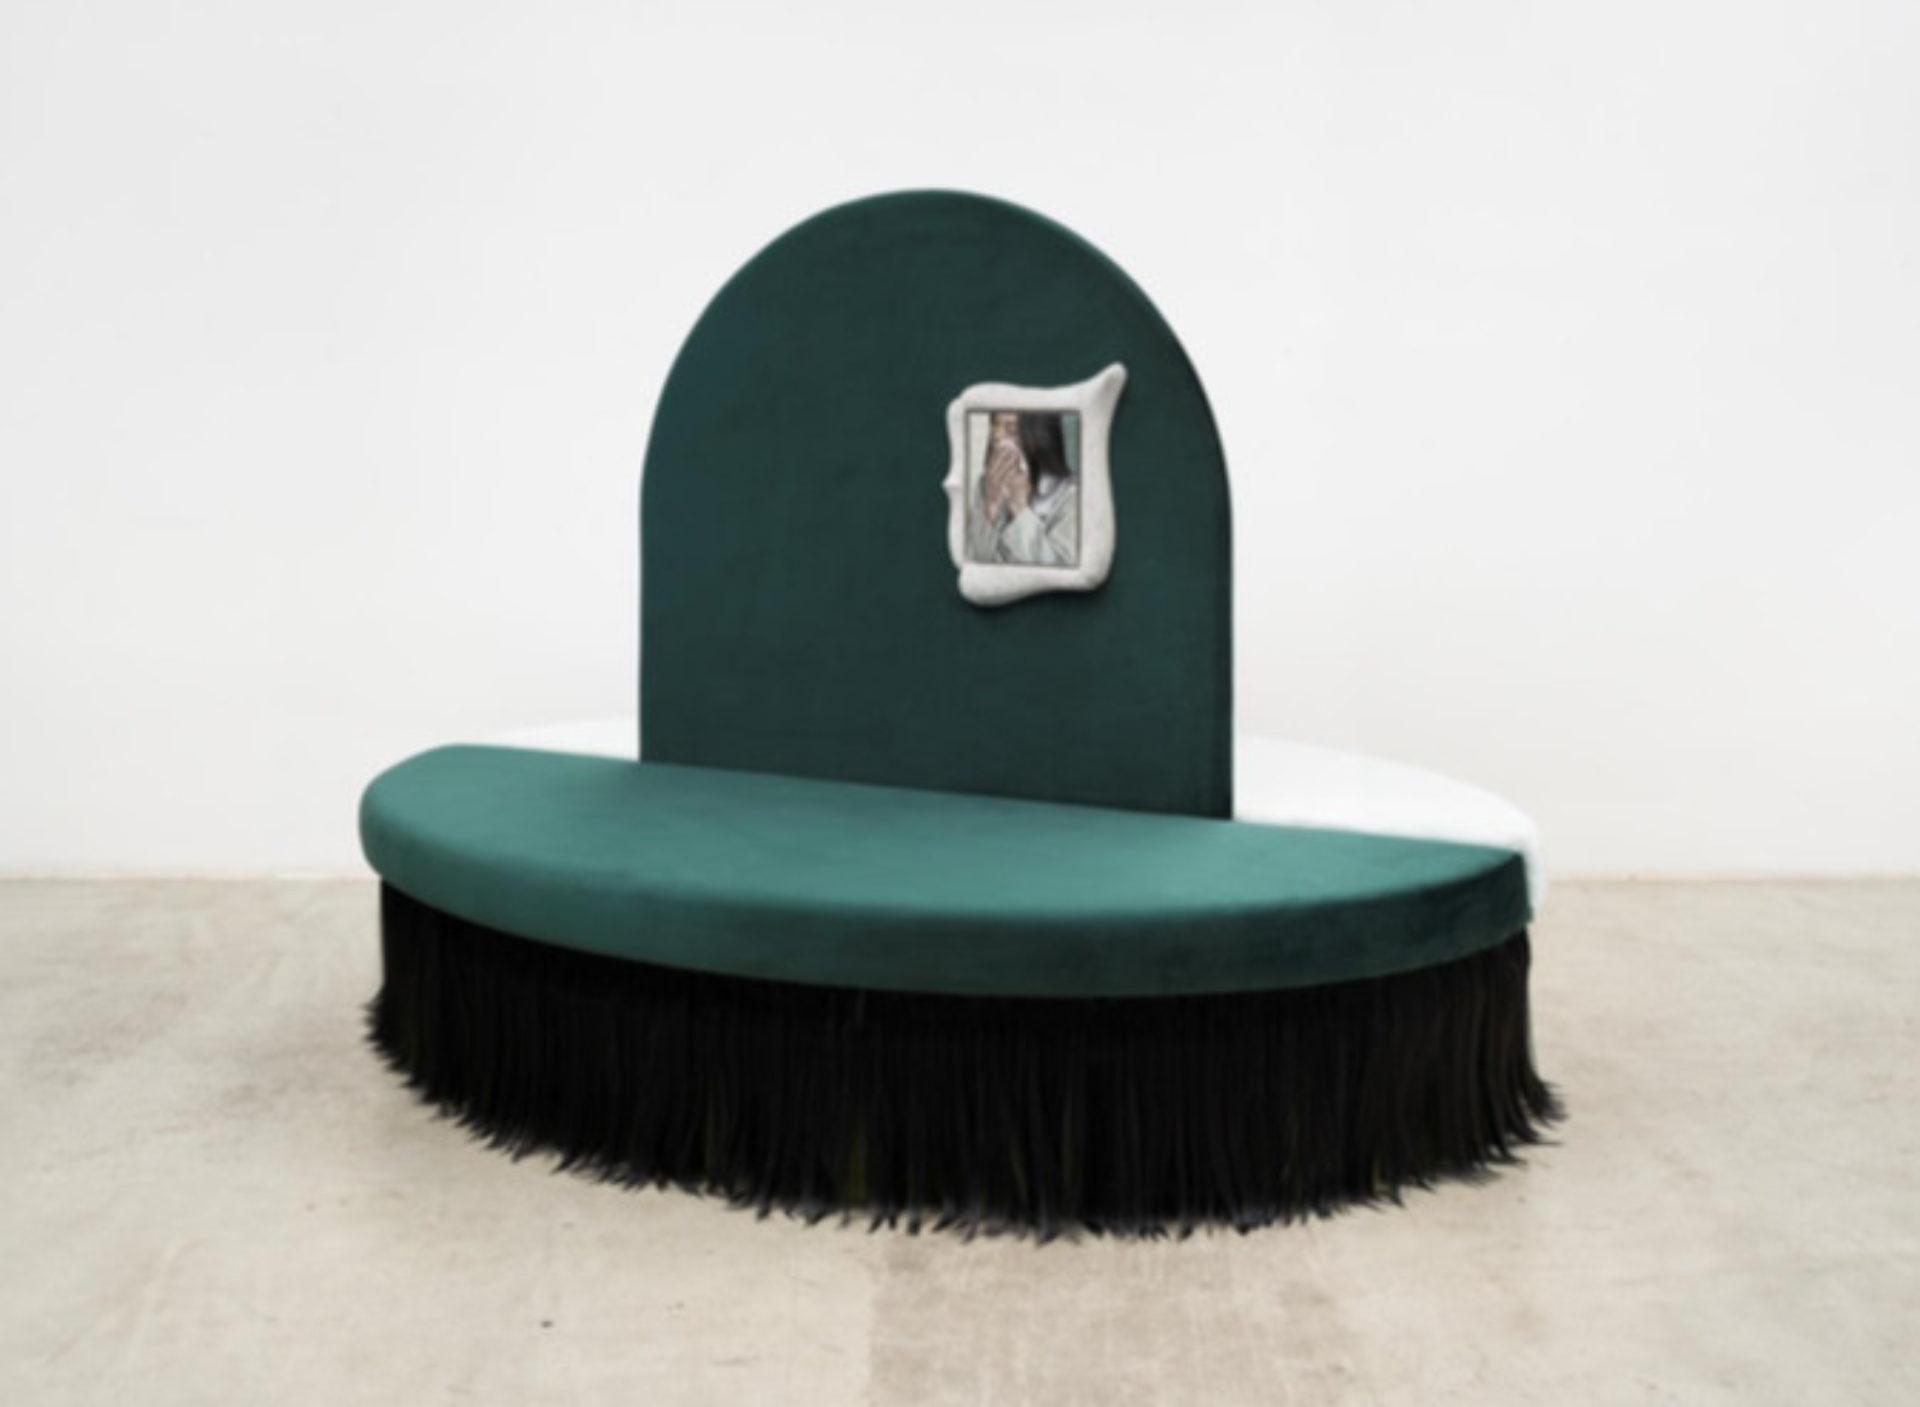 Klára Hosnedlová, Untitled, Sofa from the Series 'Ladies` Tears', 2019